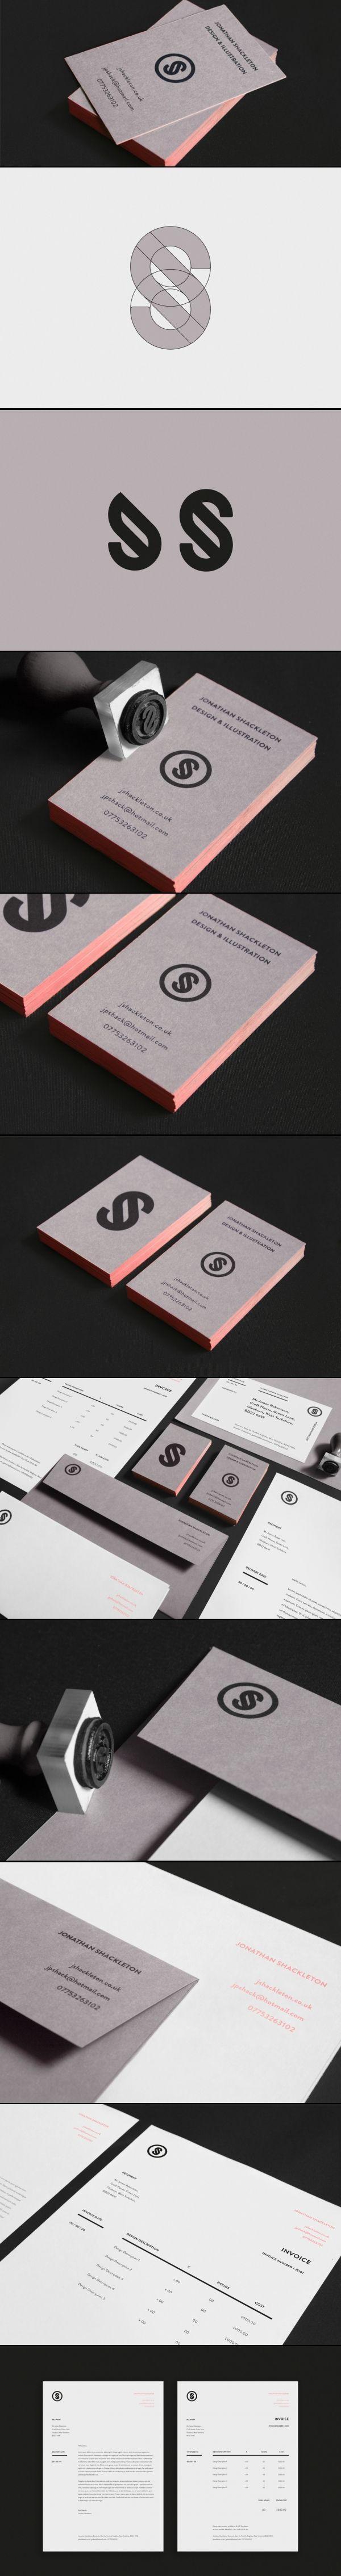 Corporate design logo business card identity